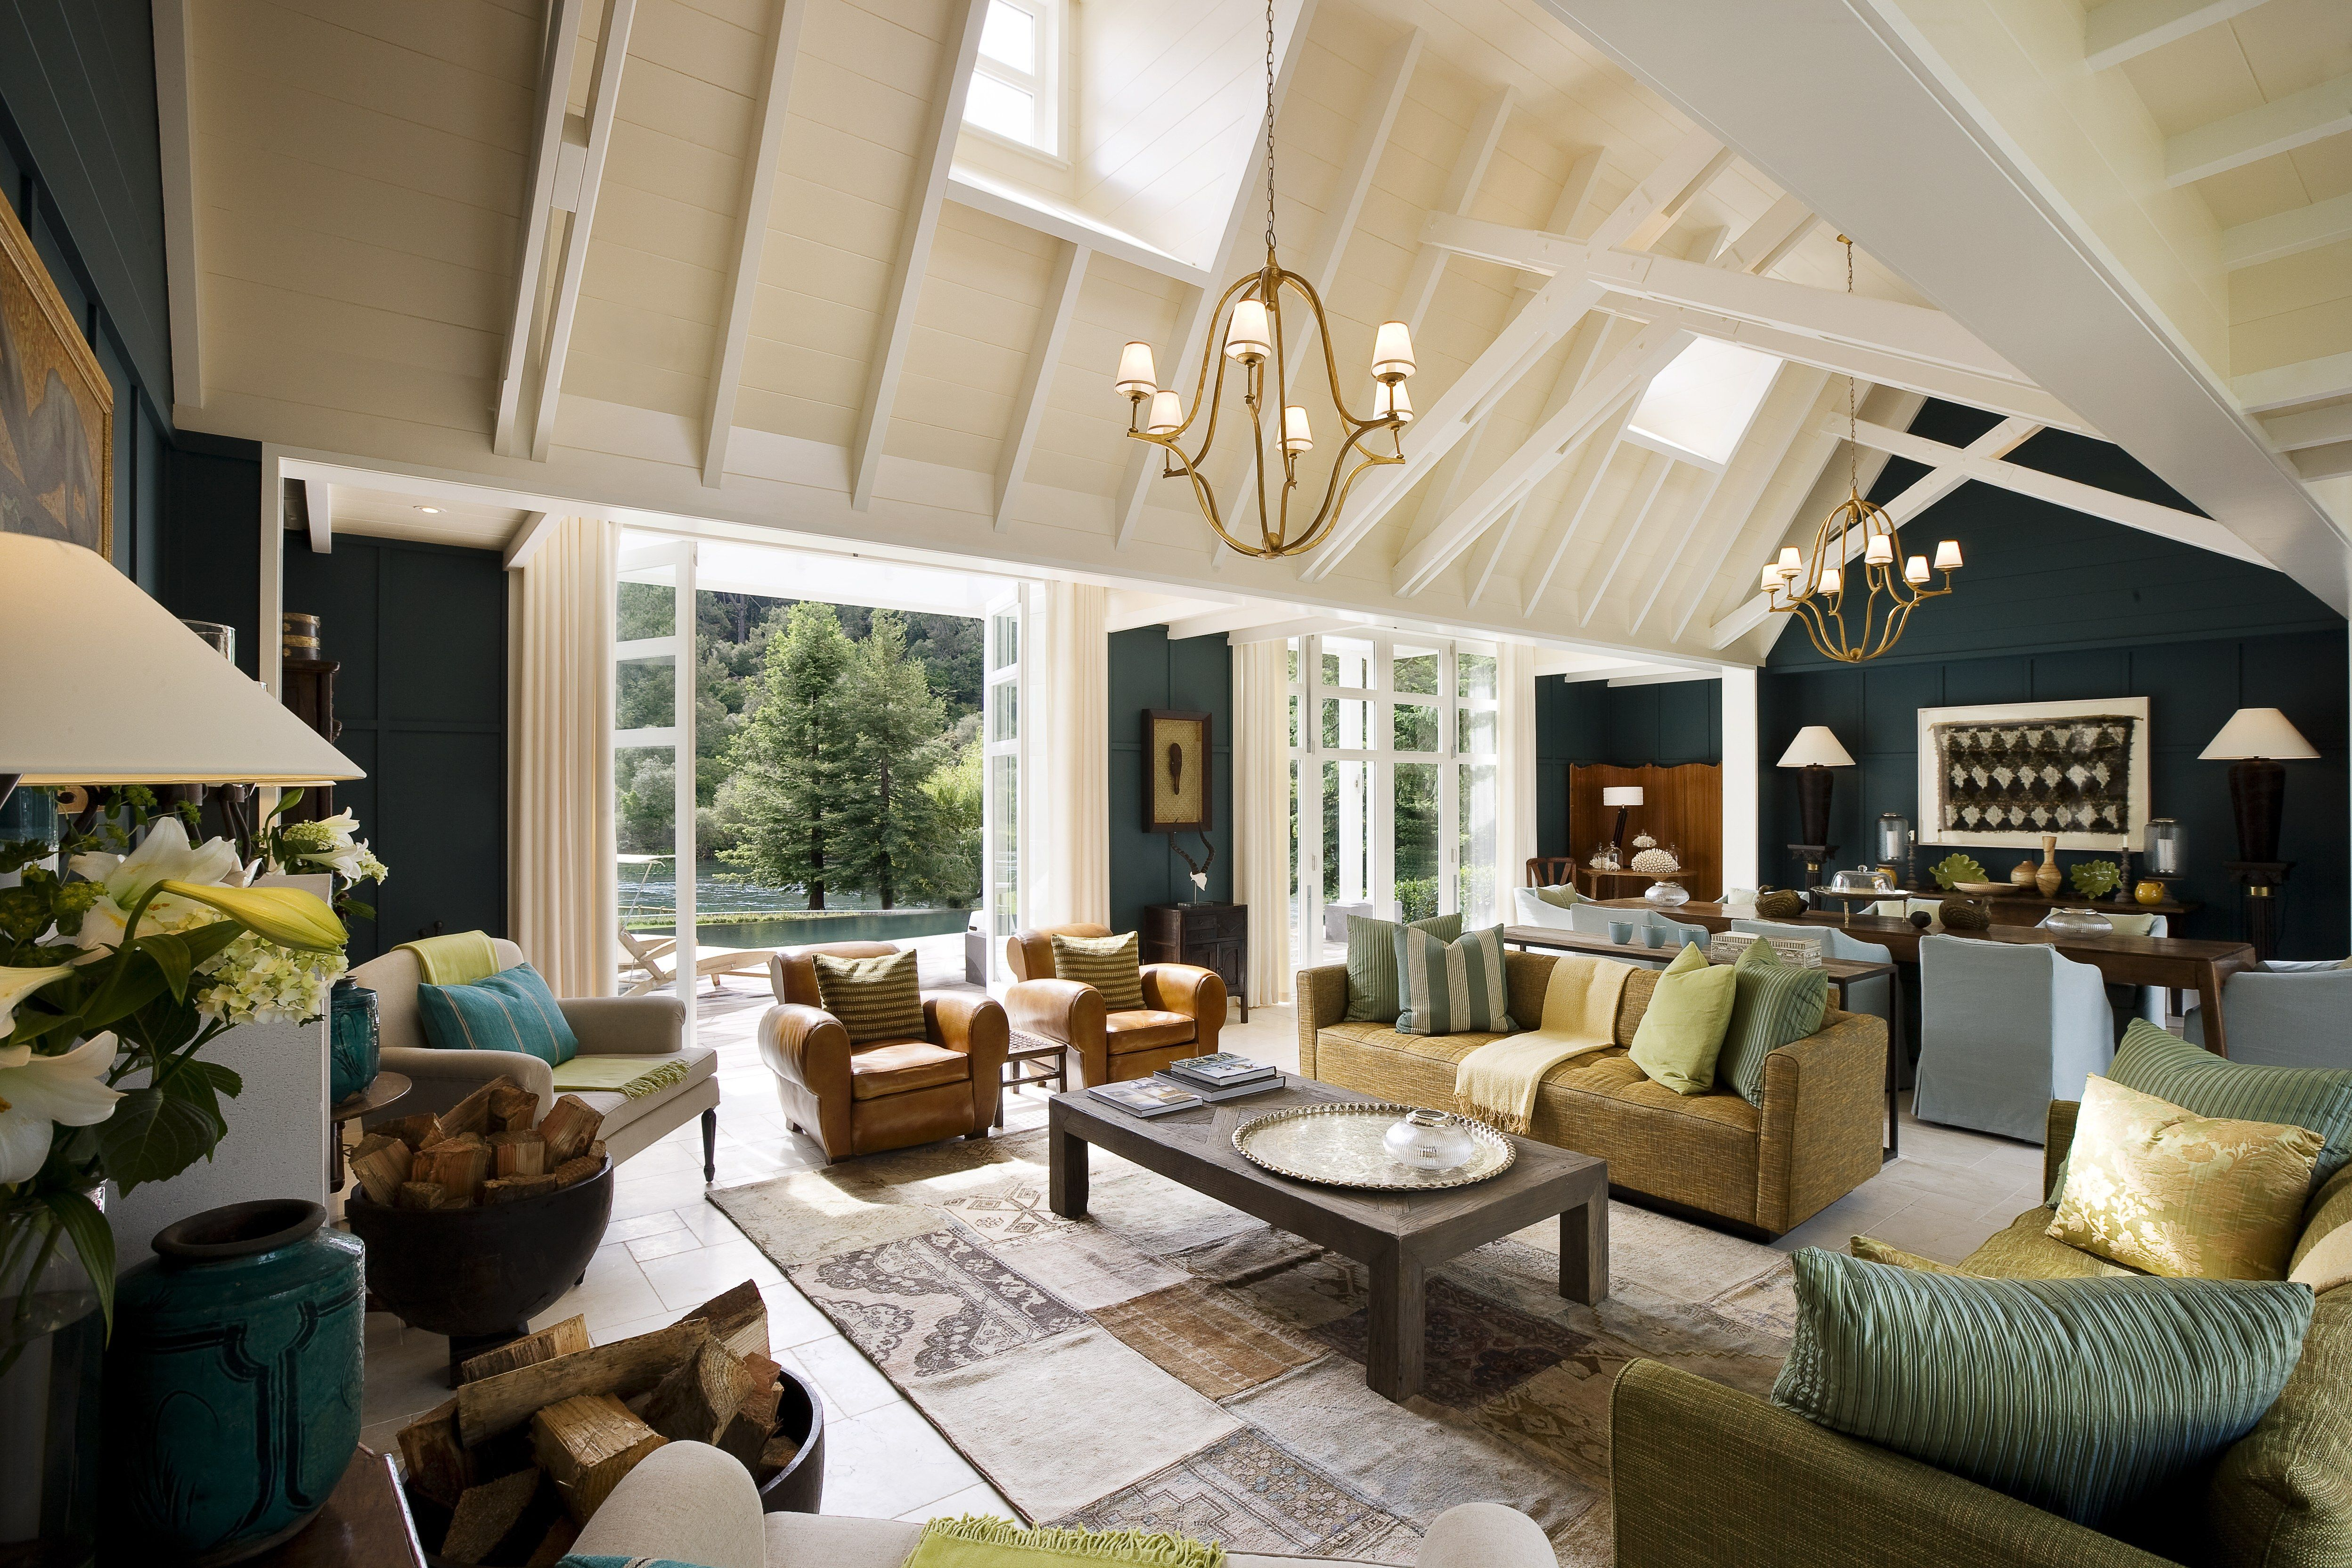 14 Hotels Favored By Queen Elizabeth Ii Home Huka Lodge Interior Design